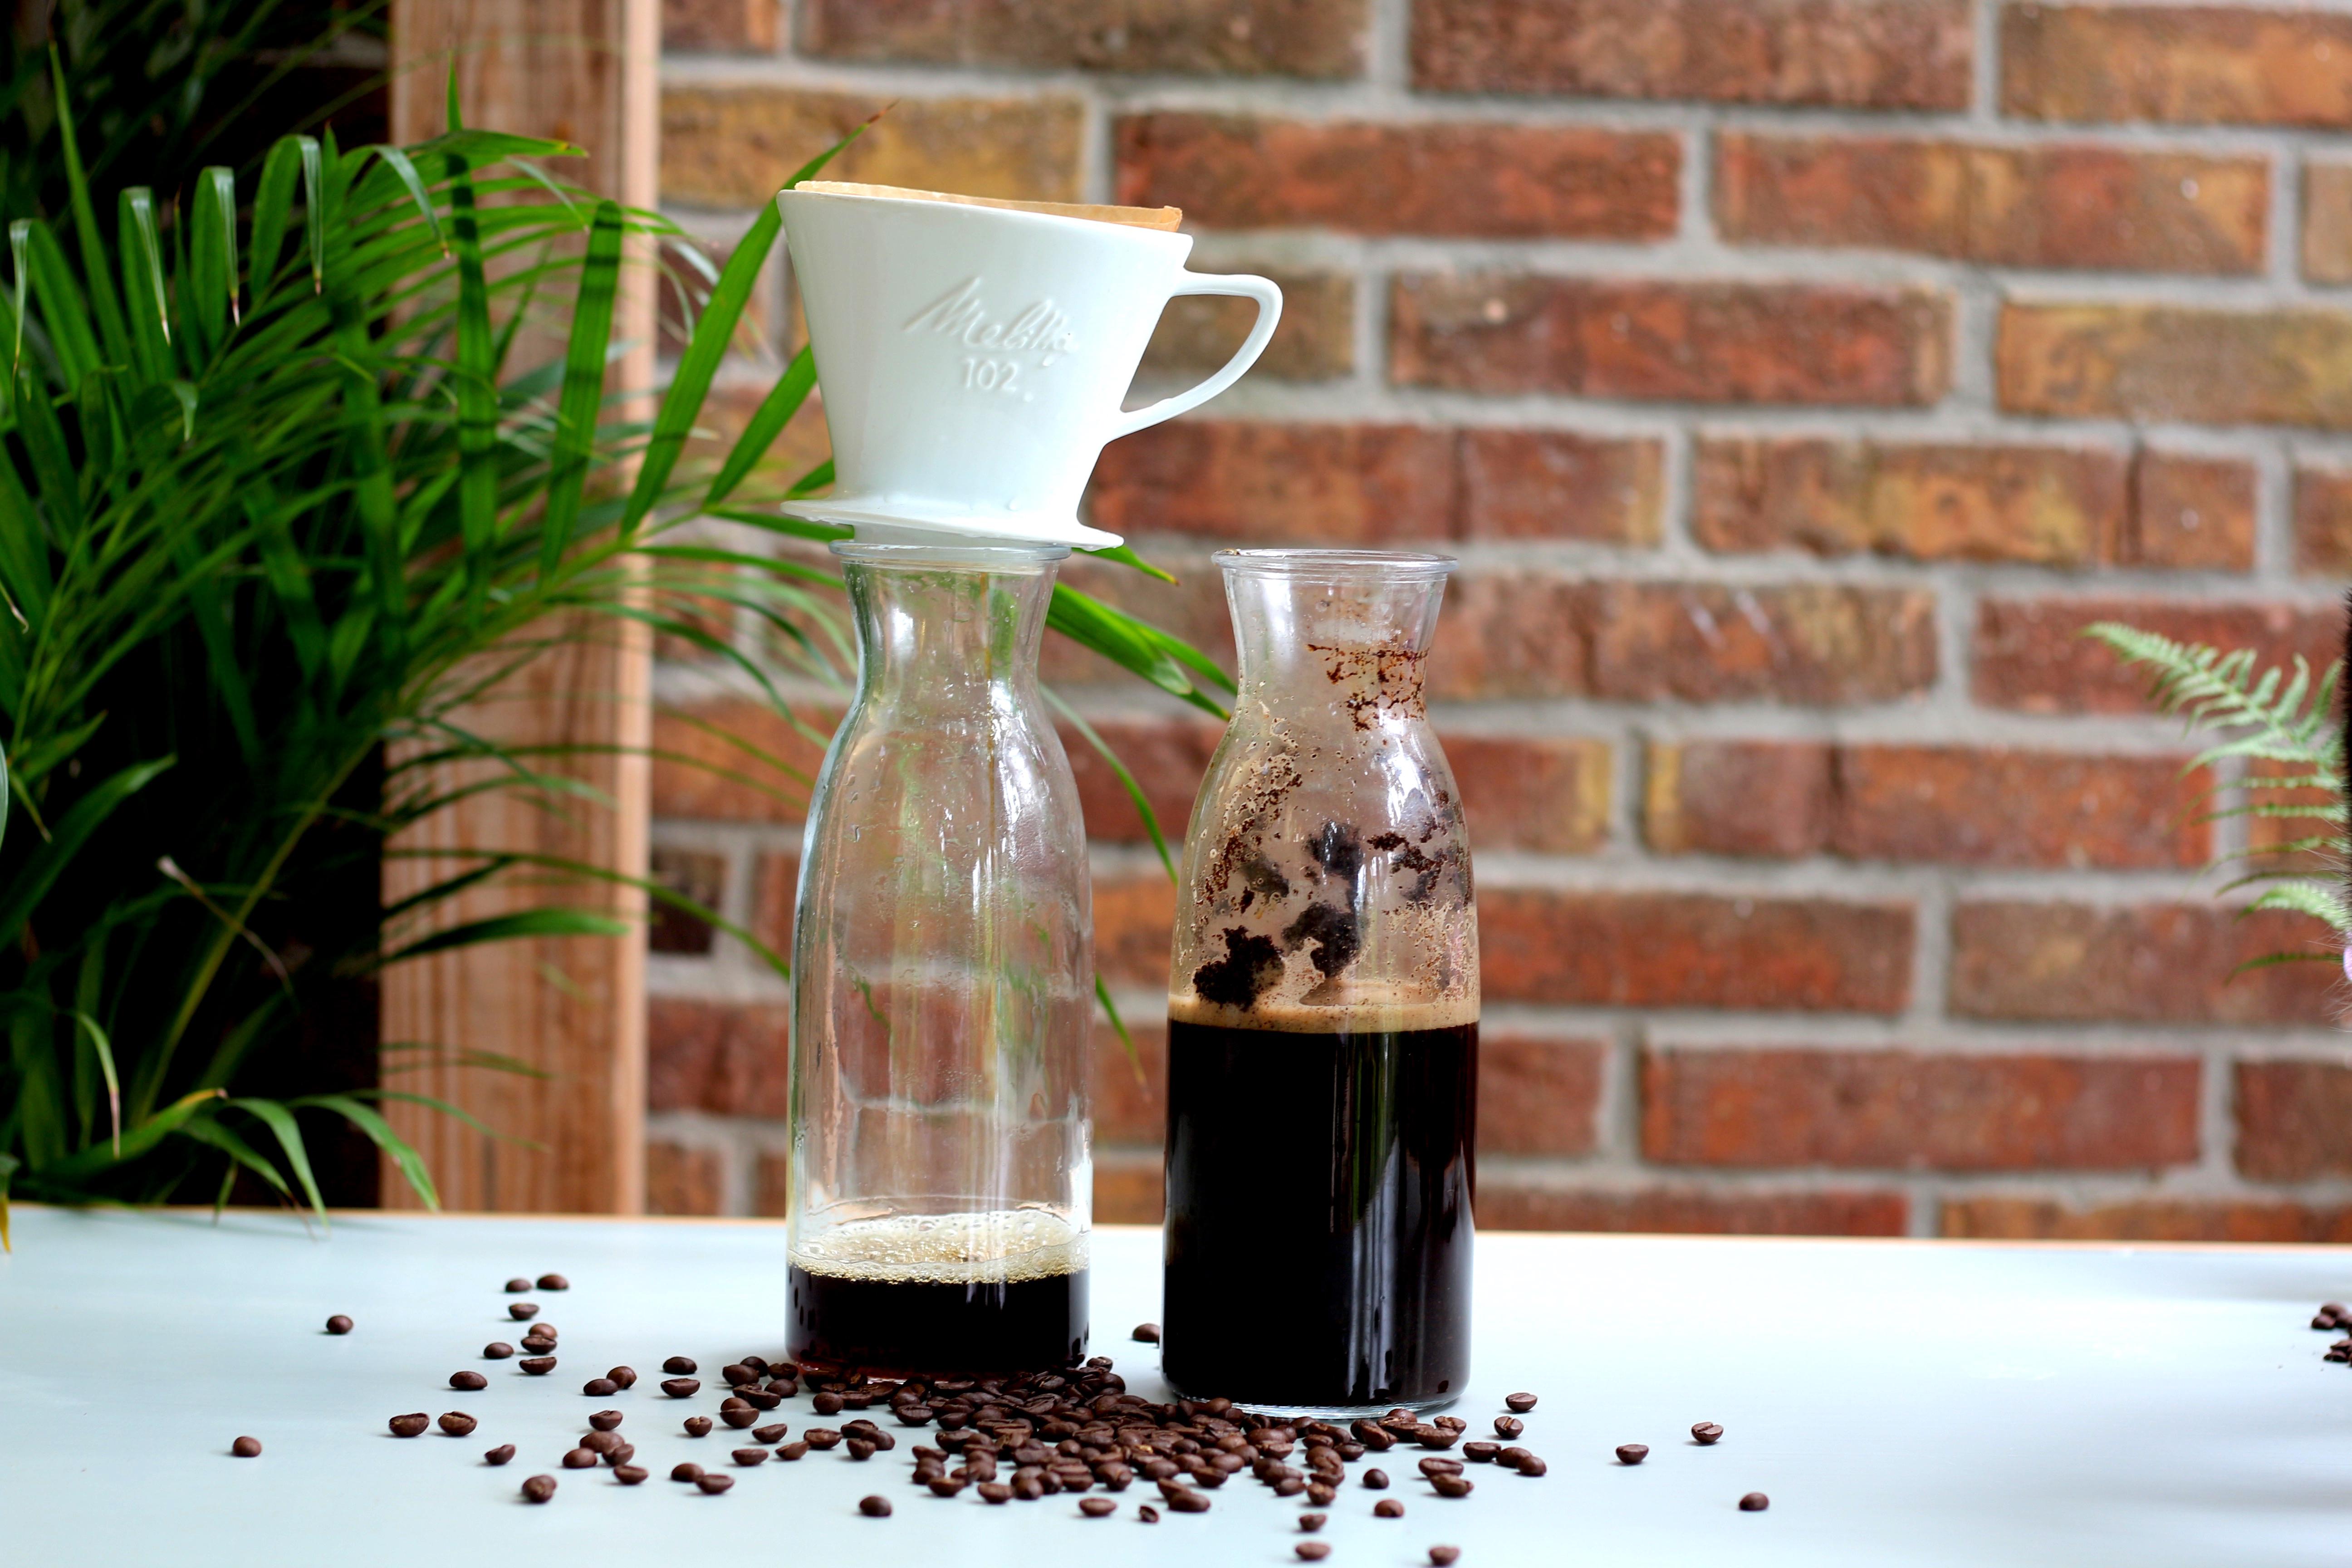 kaffee für french press